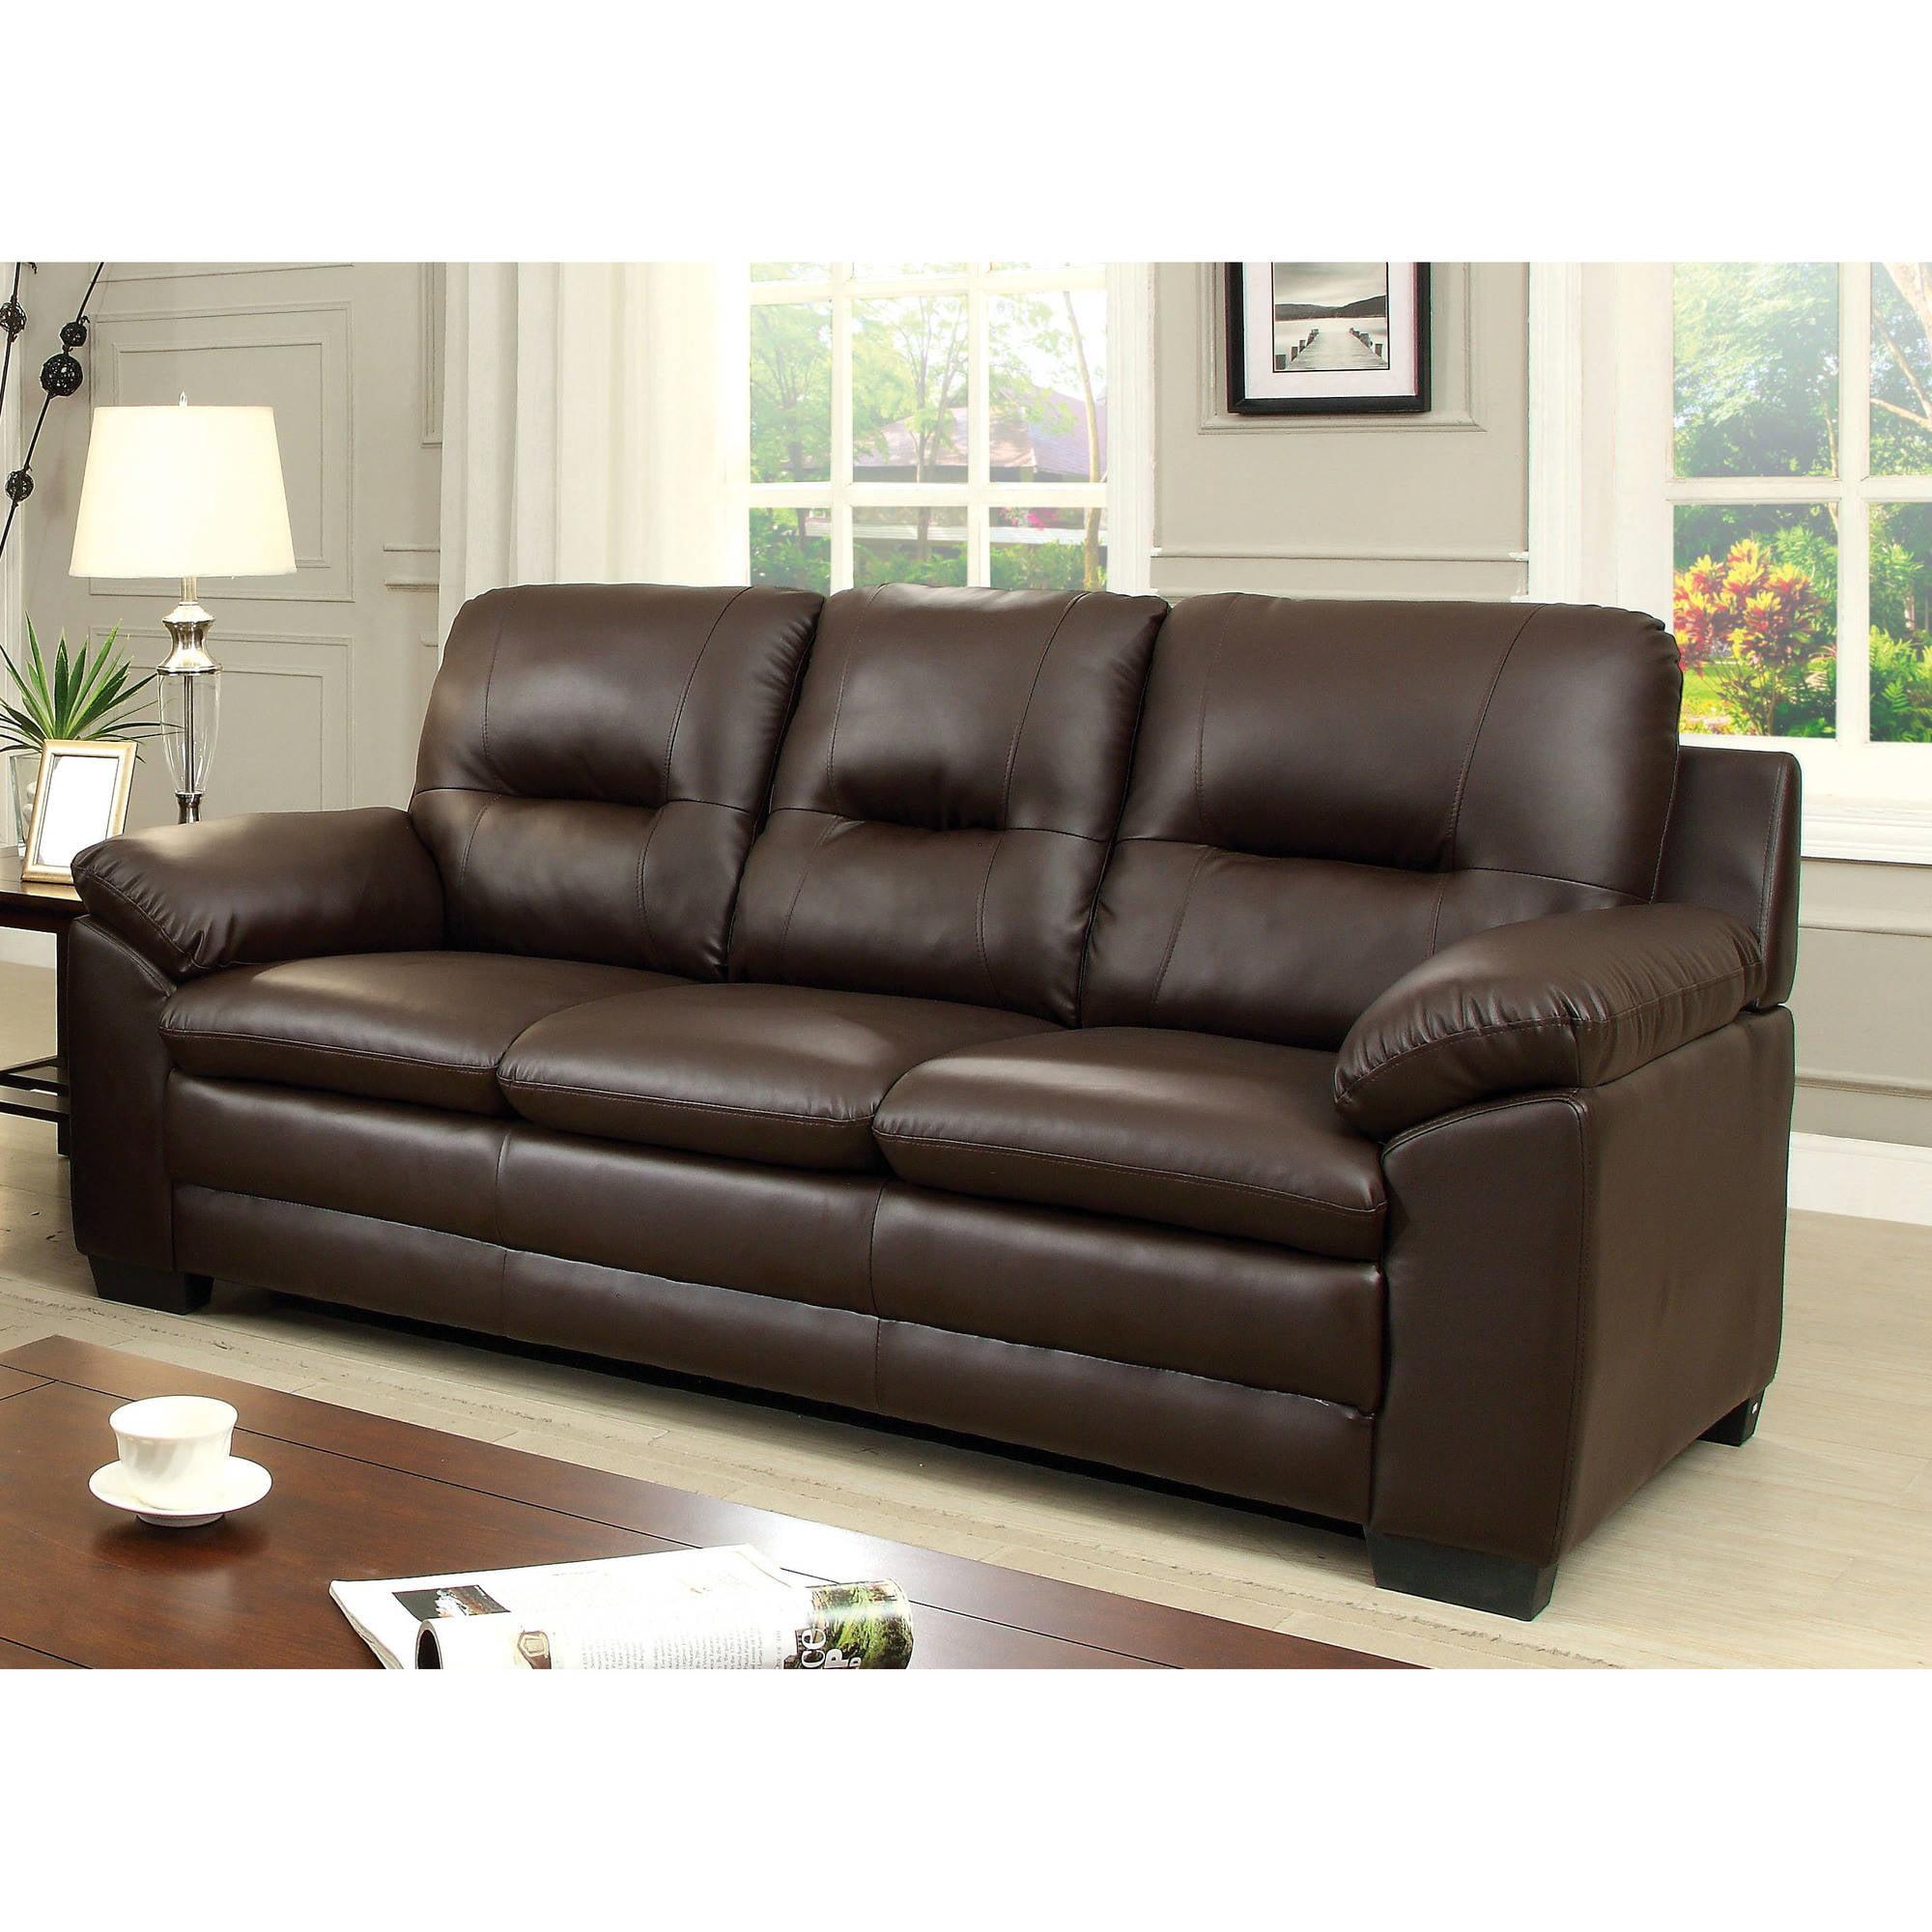 Furniture of America Truman Contemporary Leatherette Sofa, Multiple Colors